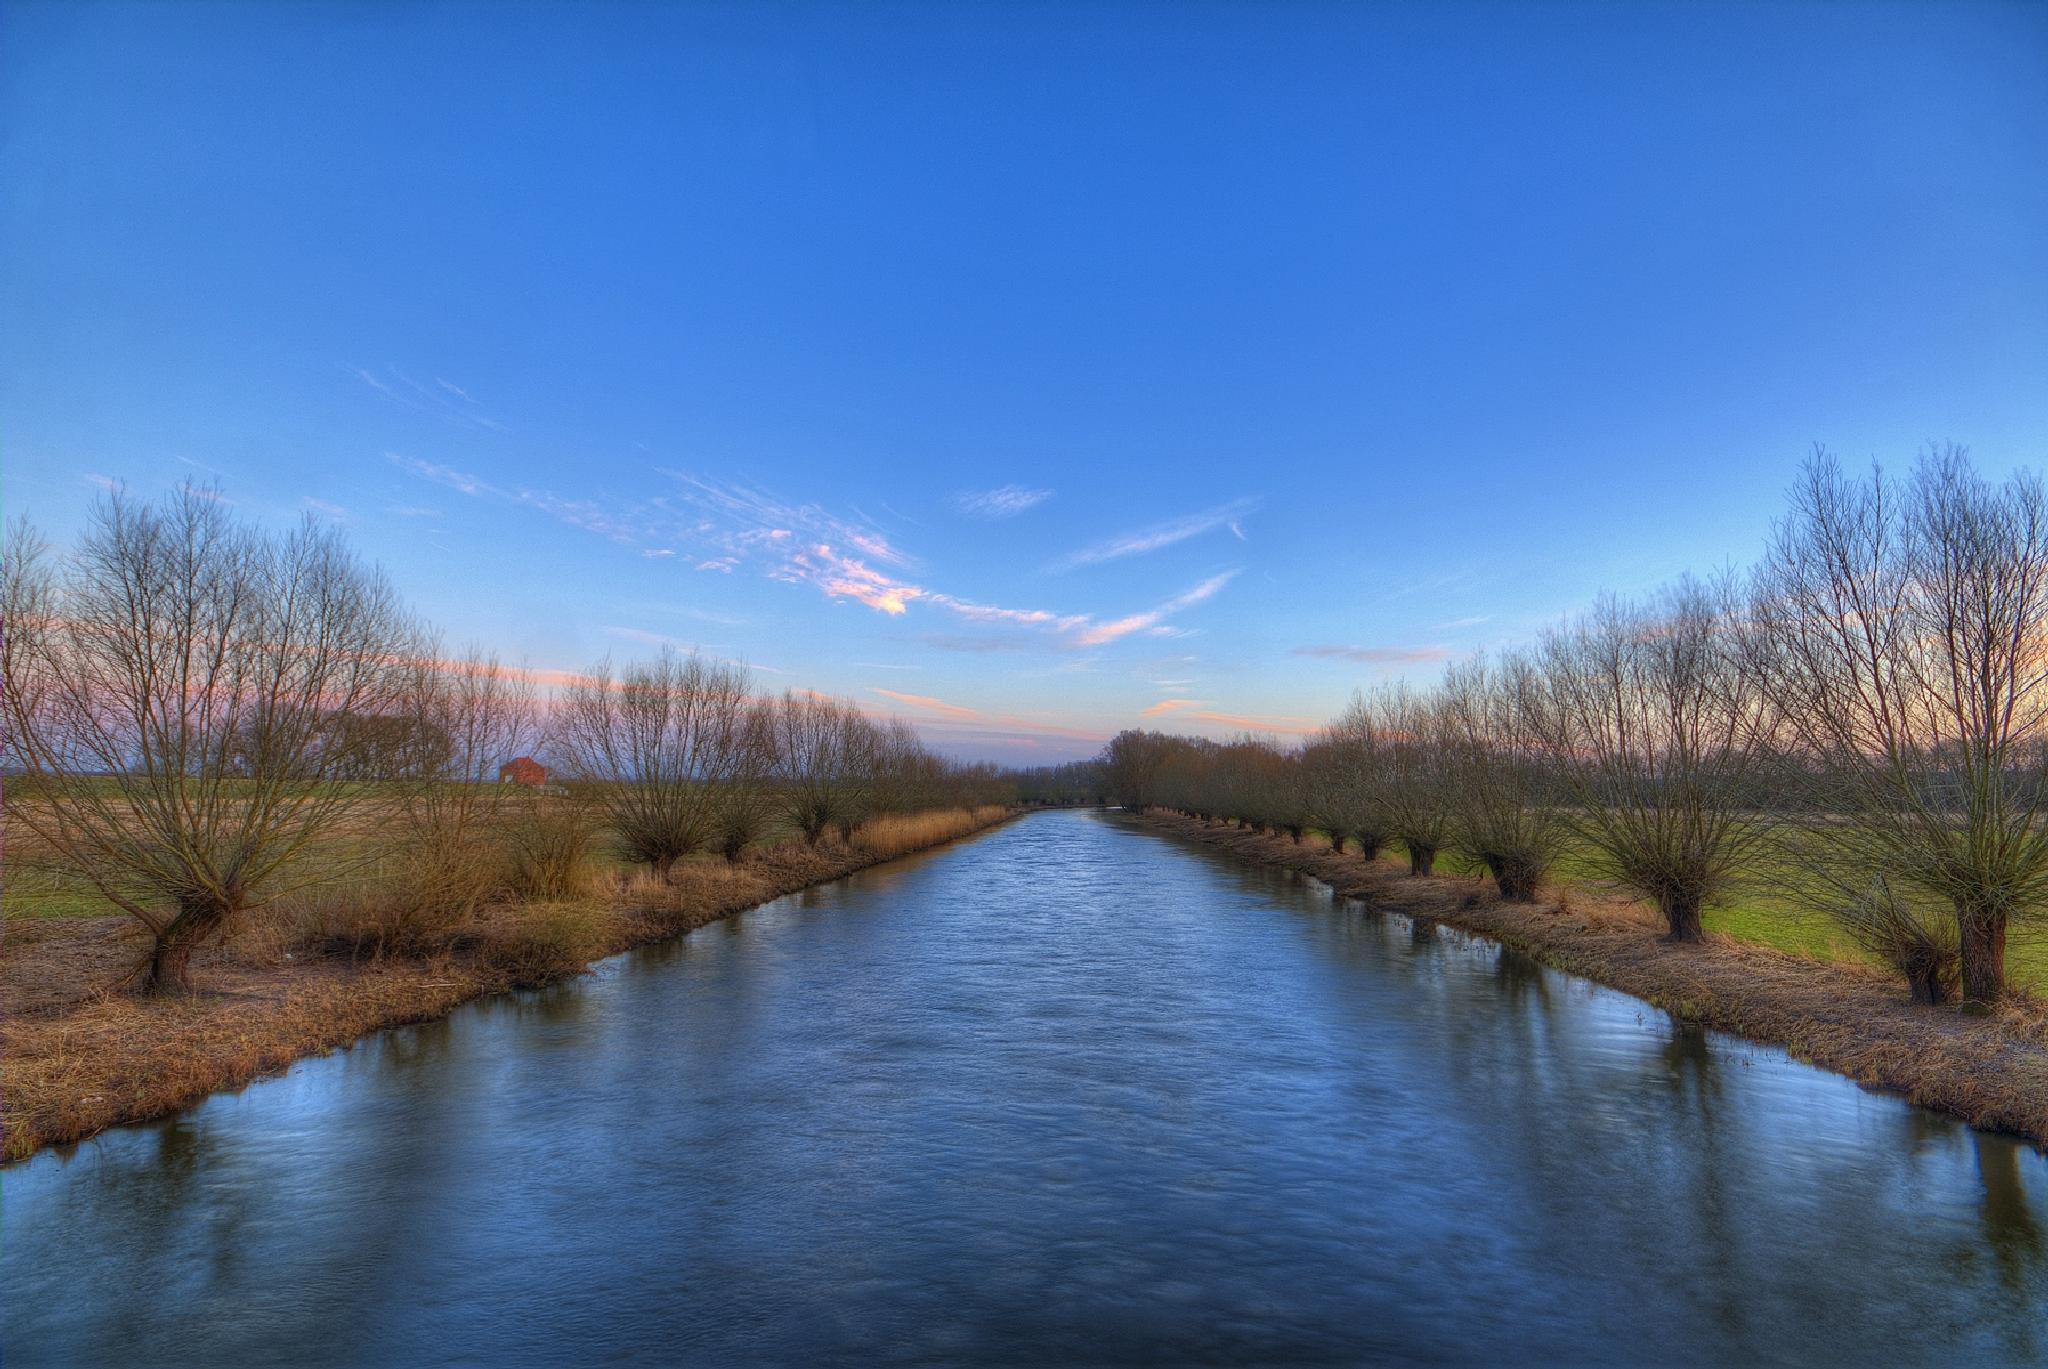 Photo in Landscape #landscape #hdr #waterscape #river #jeetzel #water #blue sky #reflection #willows #wetland #seerau #germany #2015 #canon